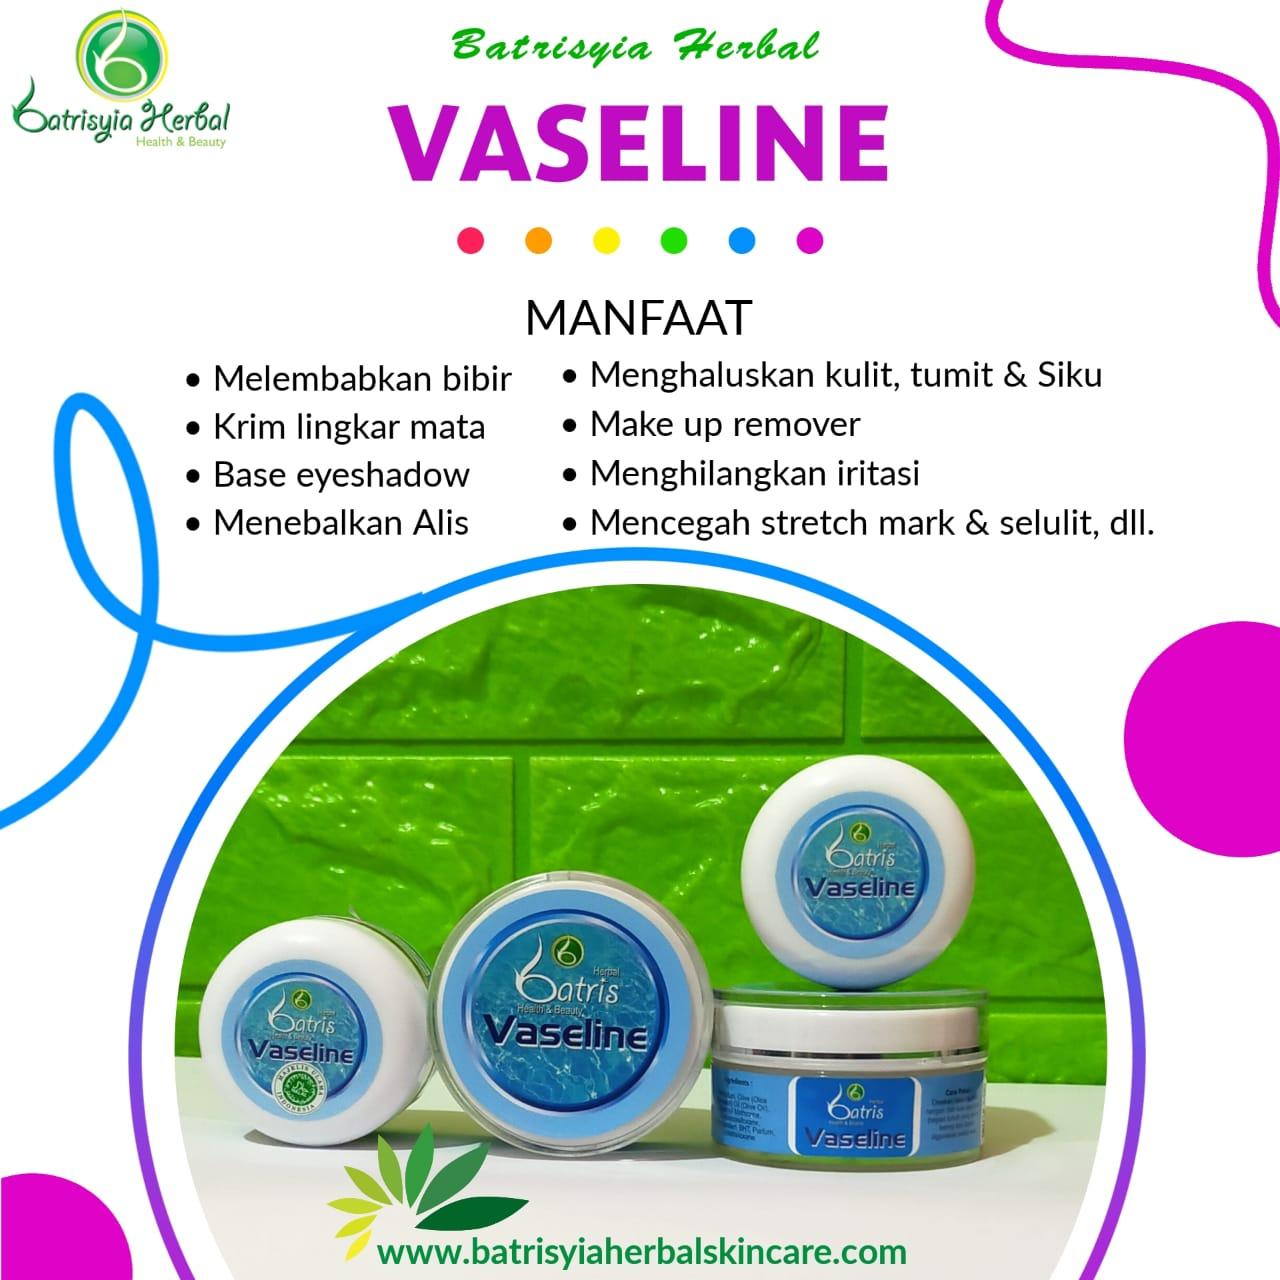 Vaseline Petroleum Jelly Batrisyia Herbal